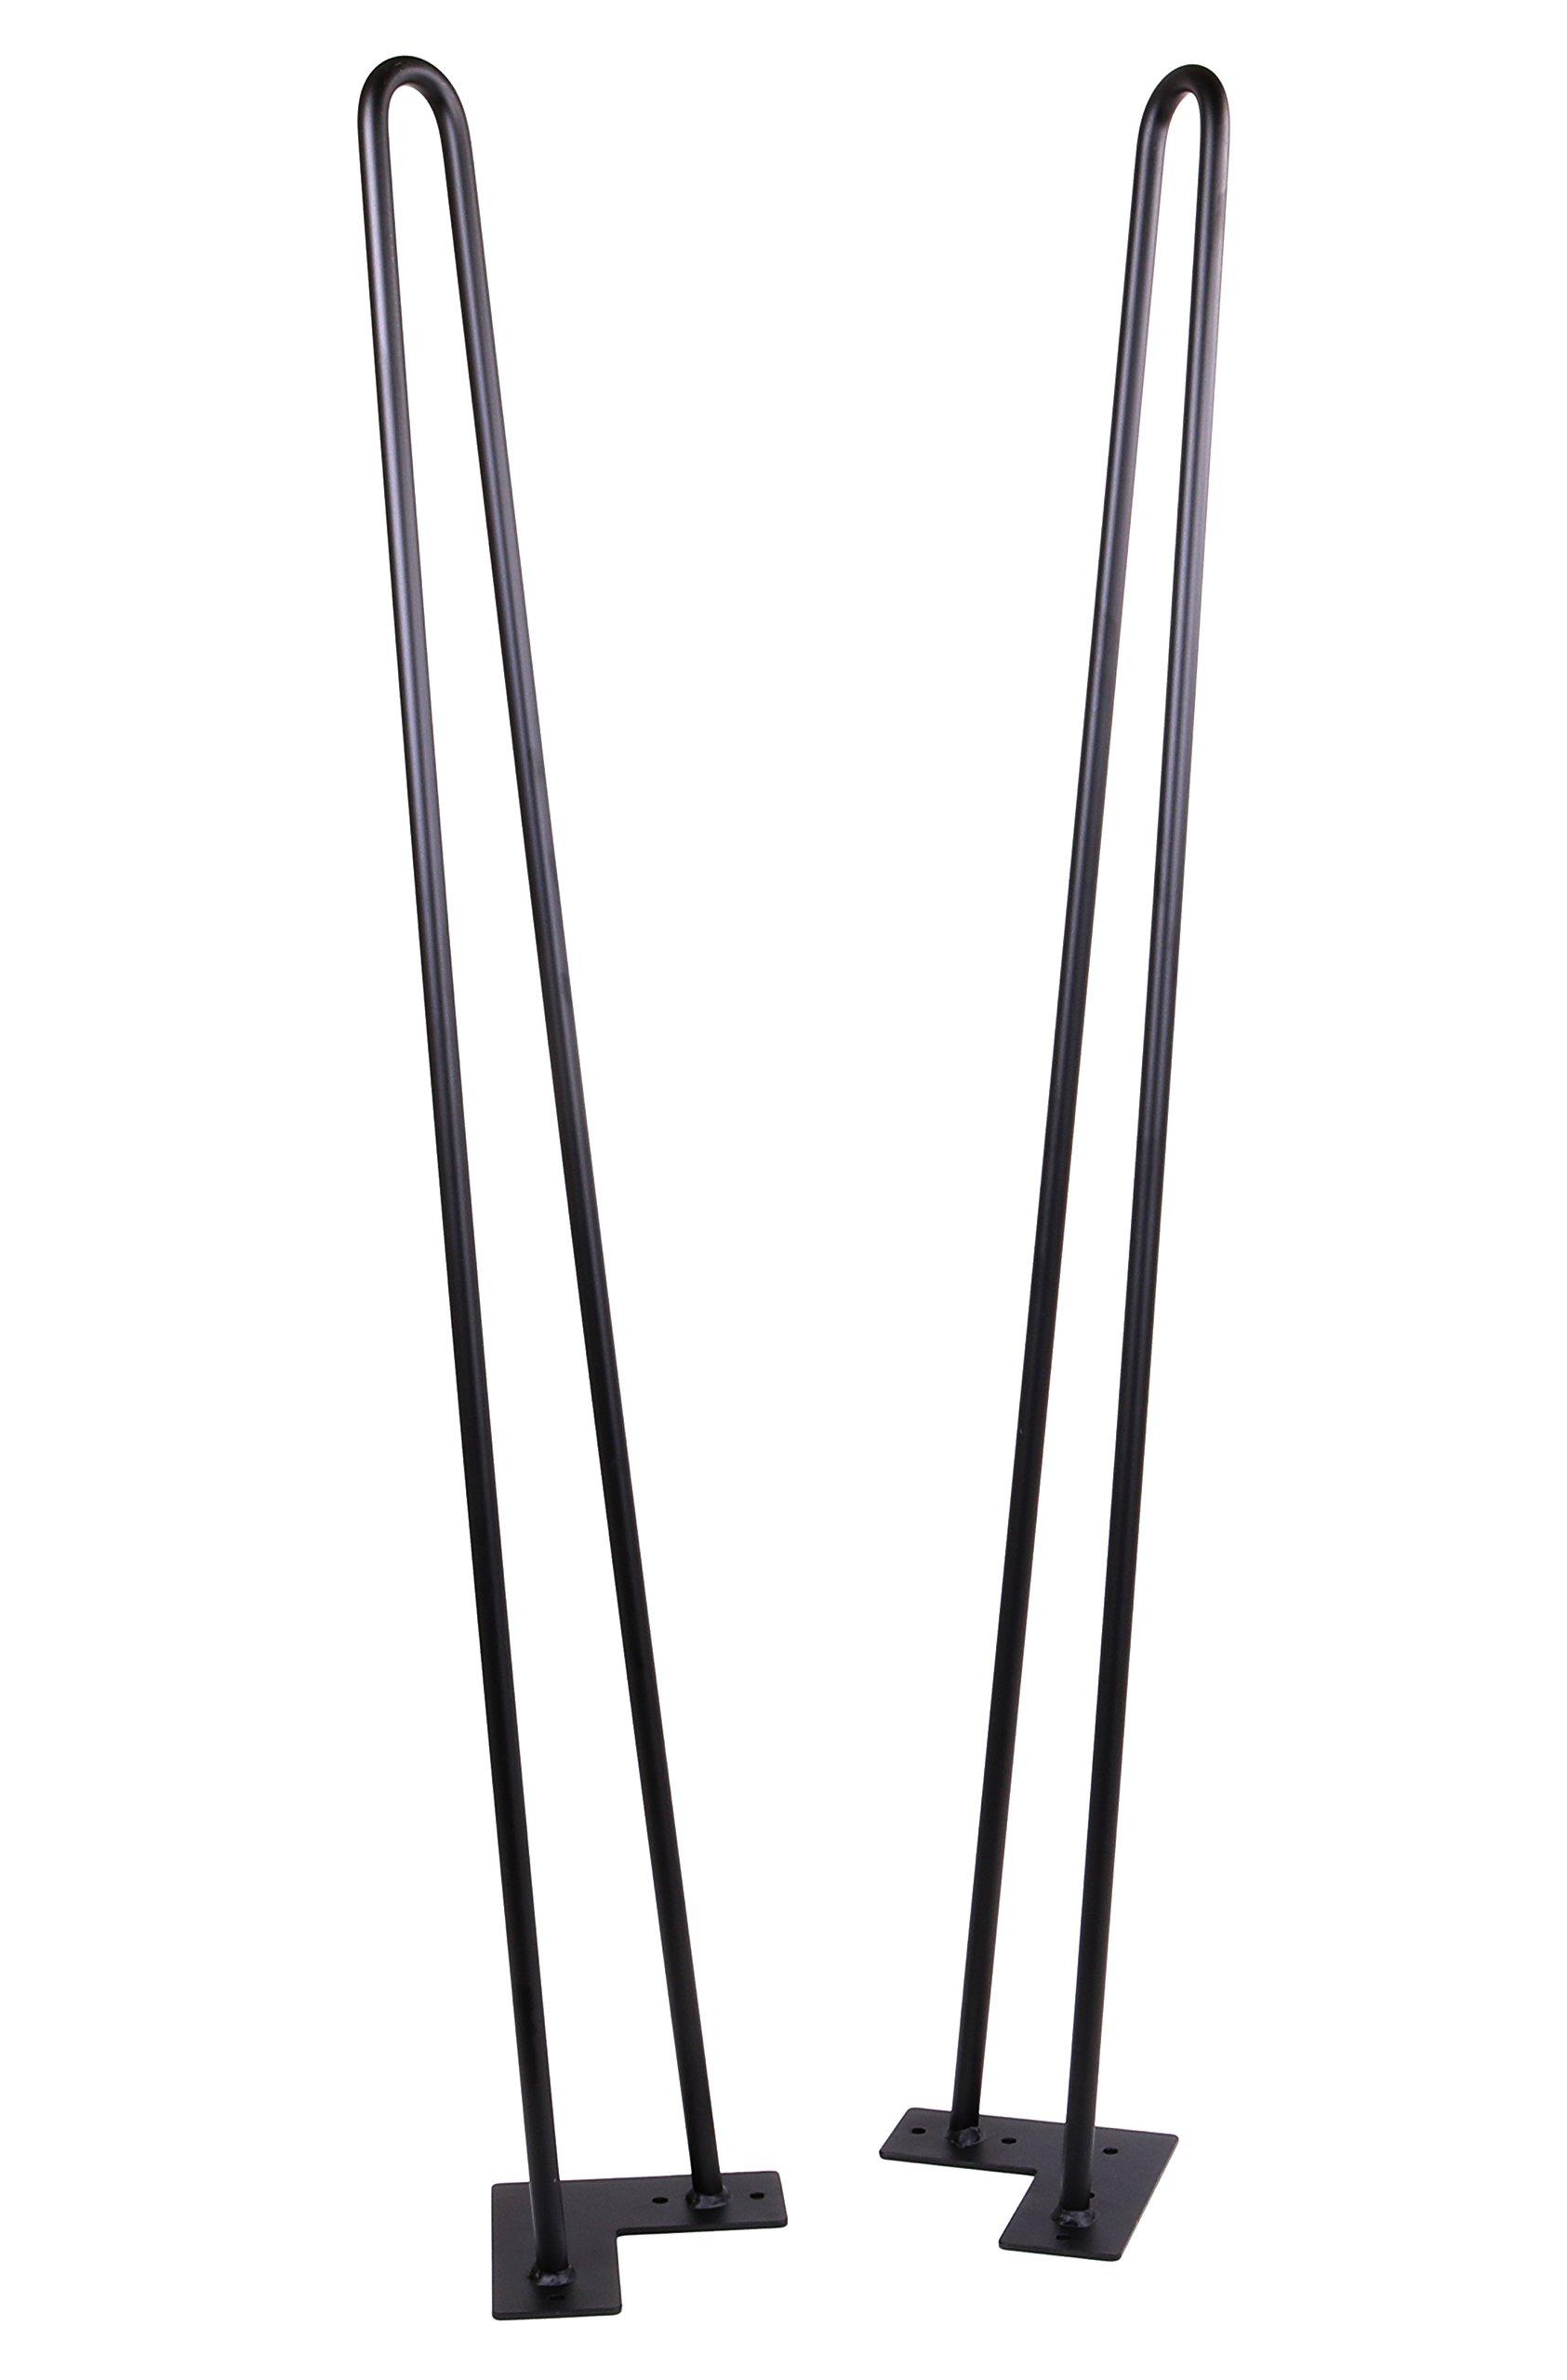 34'' Hairpin Legs (Matte Black) DIY Industrial Strength Mid Century Modern Table Legs, Set of 4 (34'') by ECLV (Image #4)